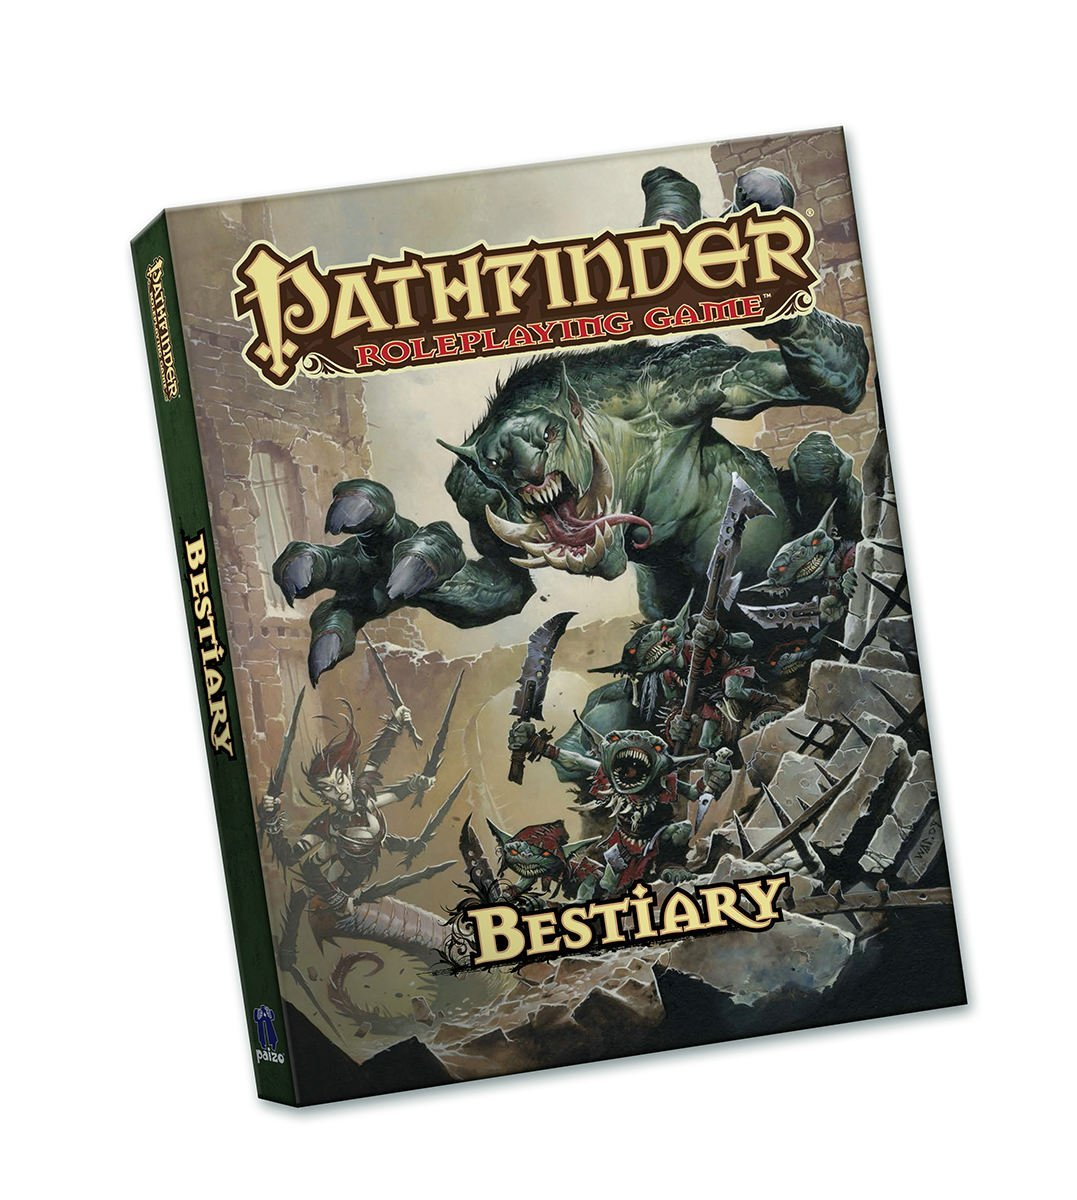 Bestiary 1 - Pathfinder 1ED Hardcover